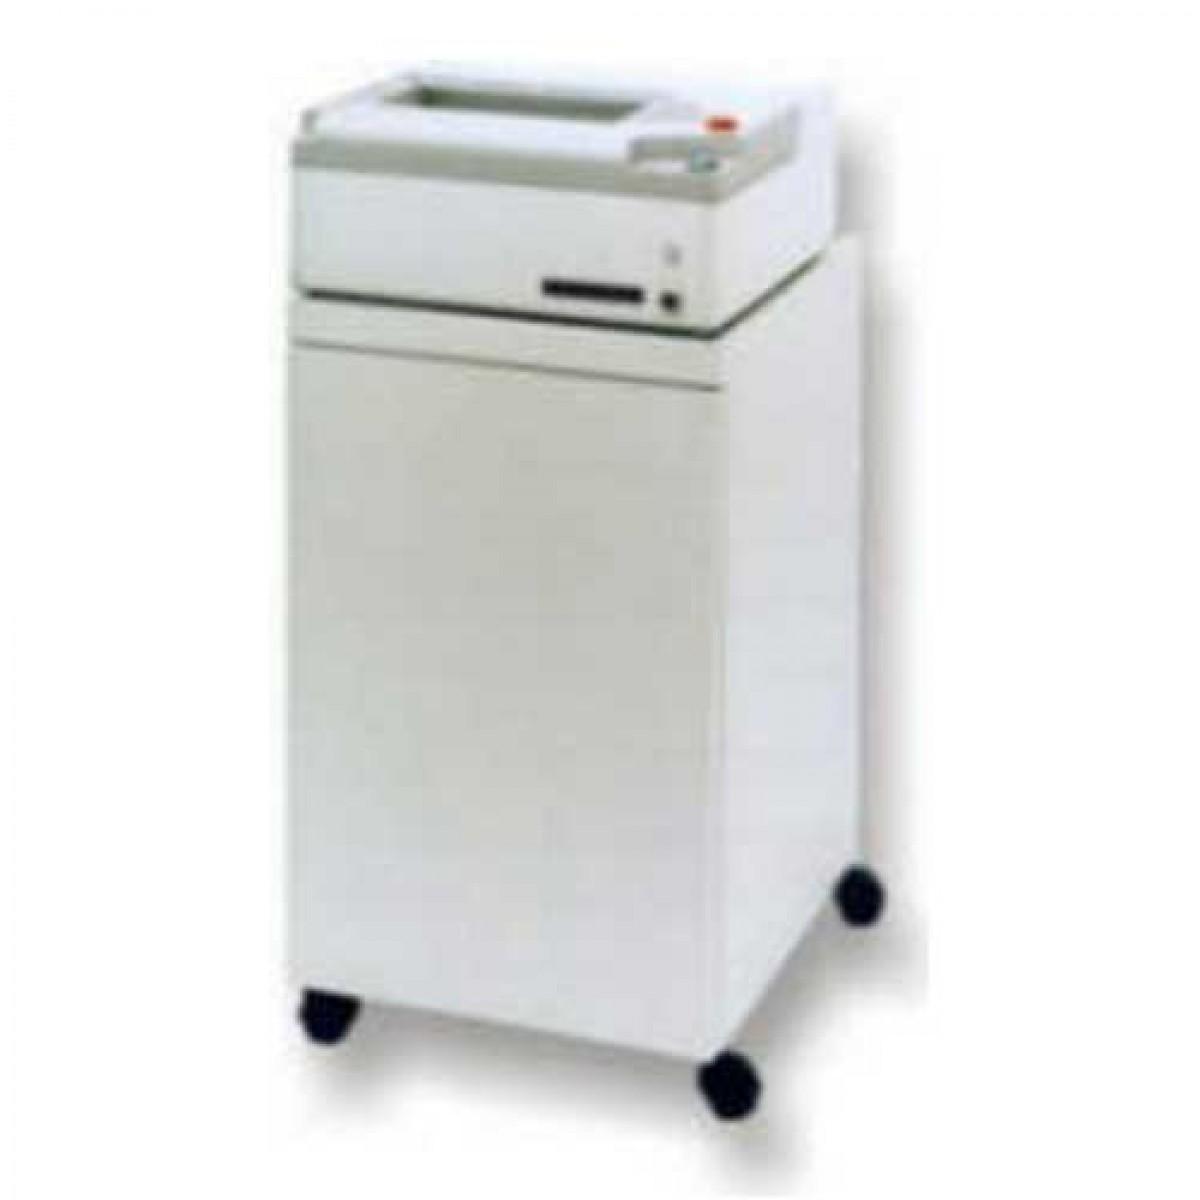 Oztec 1050-EC Paper Shredder High Capacity Cabinet